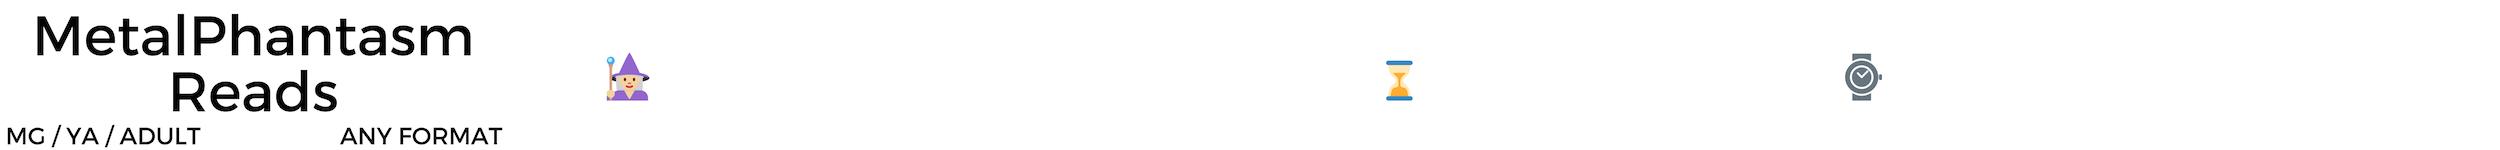 BOOK BLOG COMMUNITY _ BANNER + PROFILES [2500 x 150] (13).jpg